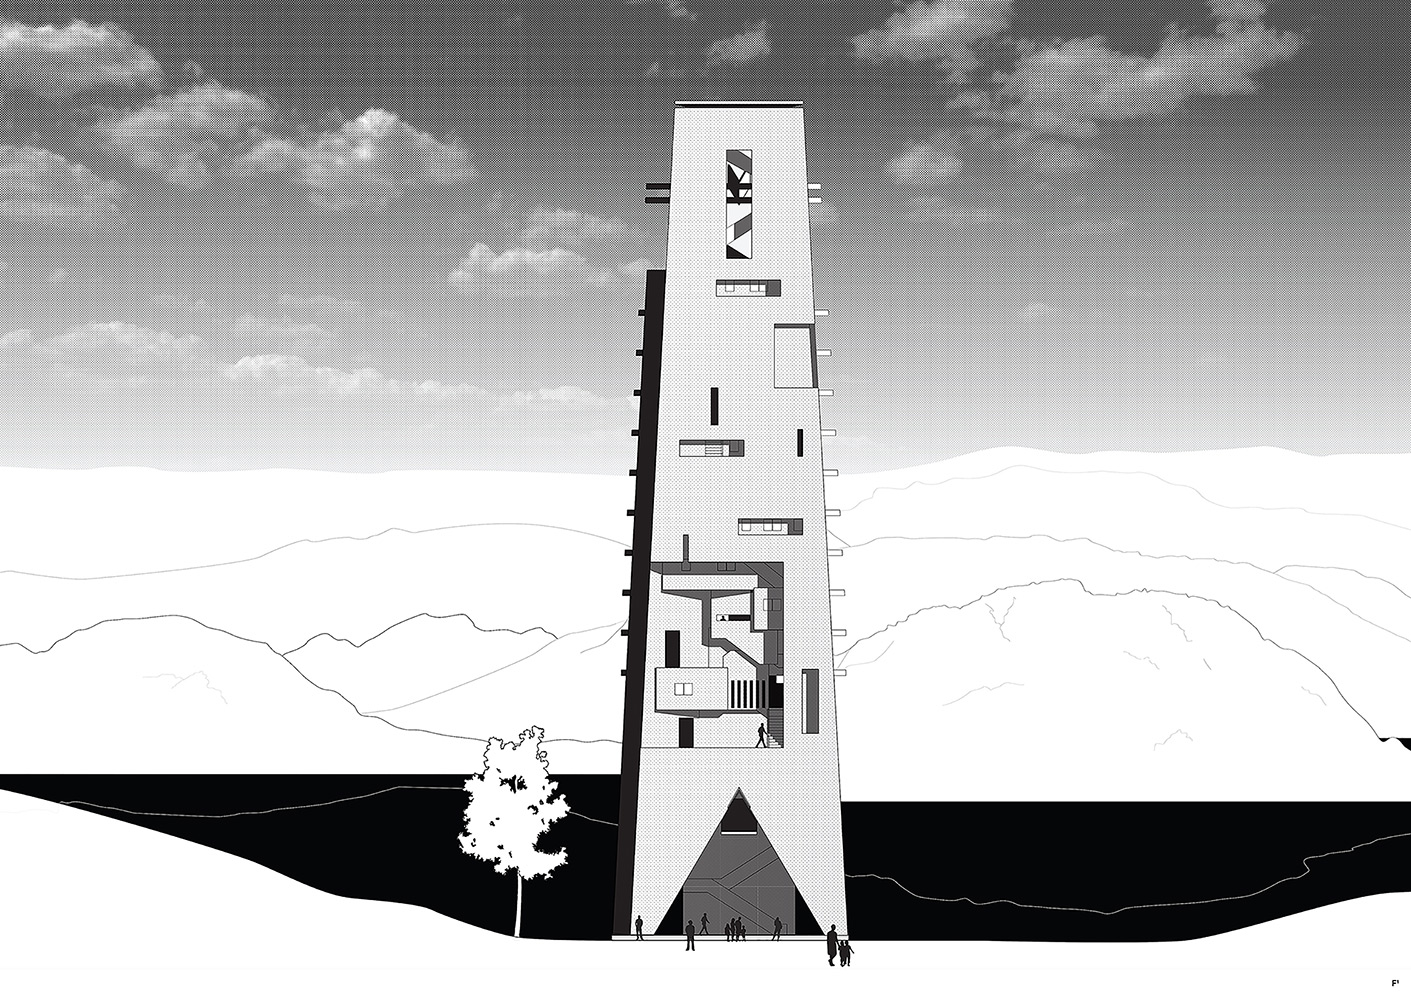 Tårnet i landskapet i tårnet, AFK, Arkitektur, Arkitekt, Knut Folstad, Tårn, Godalen, Stavanger, DNT, Turisthytte, Konsept, Betong, Silo, Fjell, Gandsfjorden